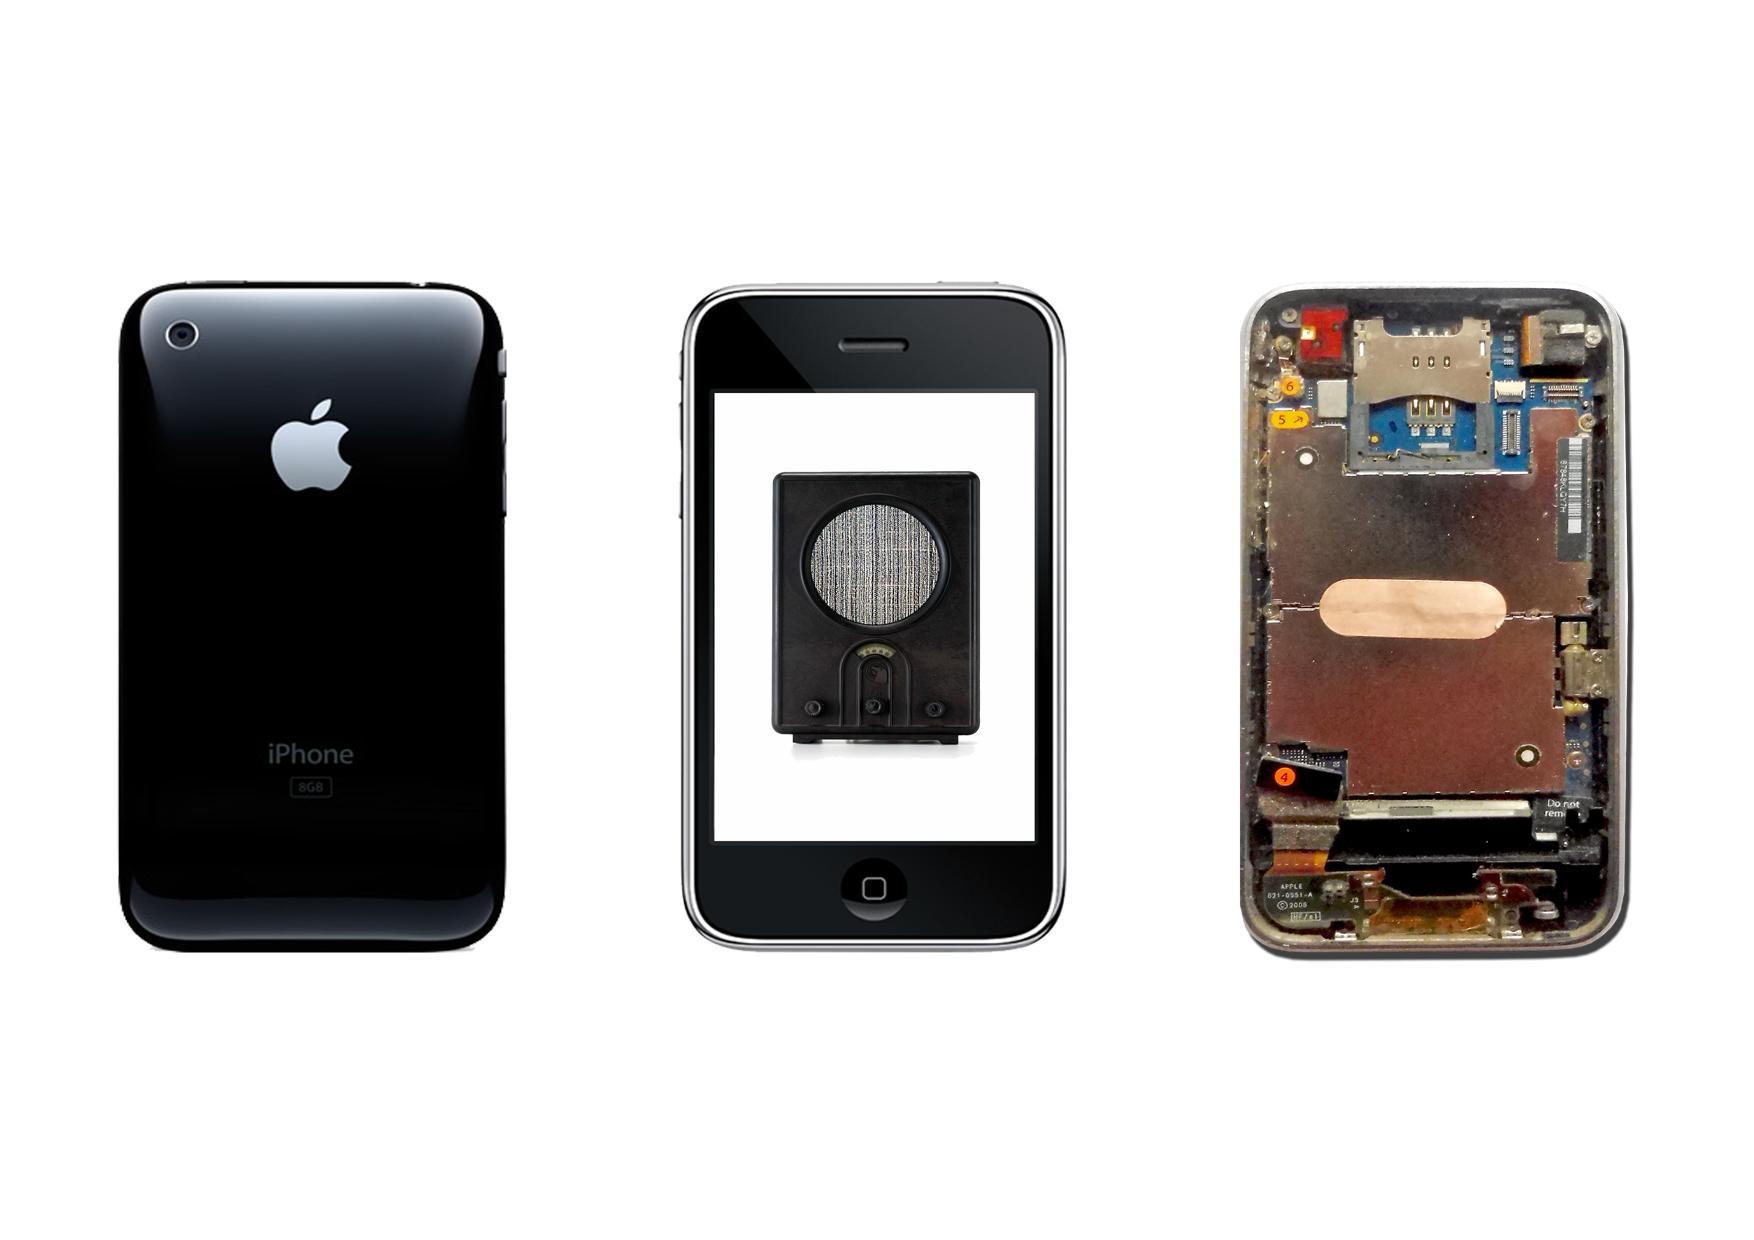 IPhone G3 2008